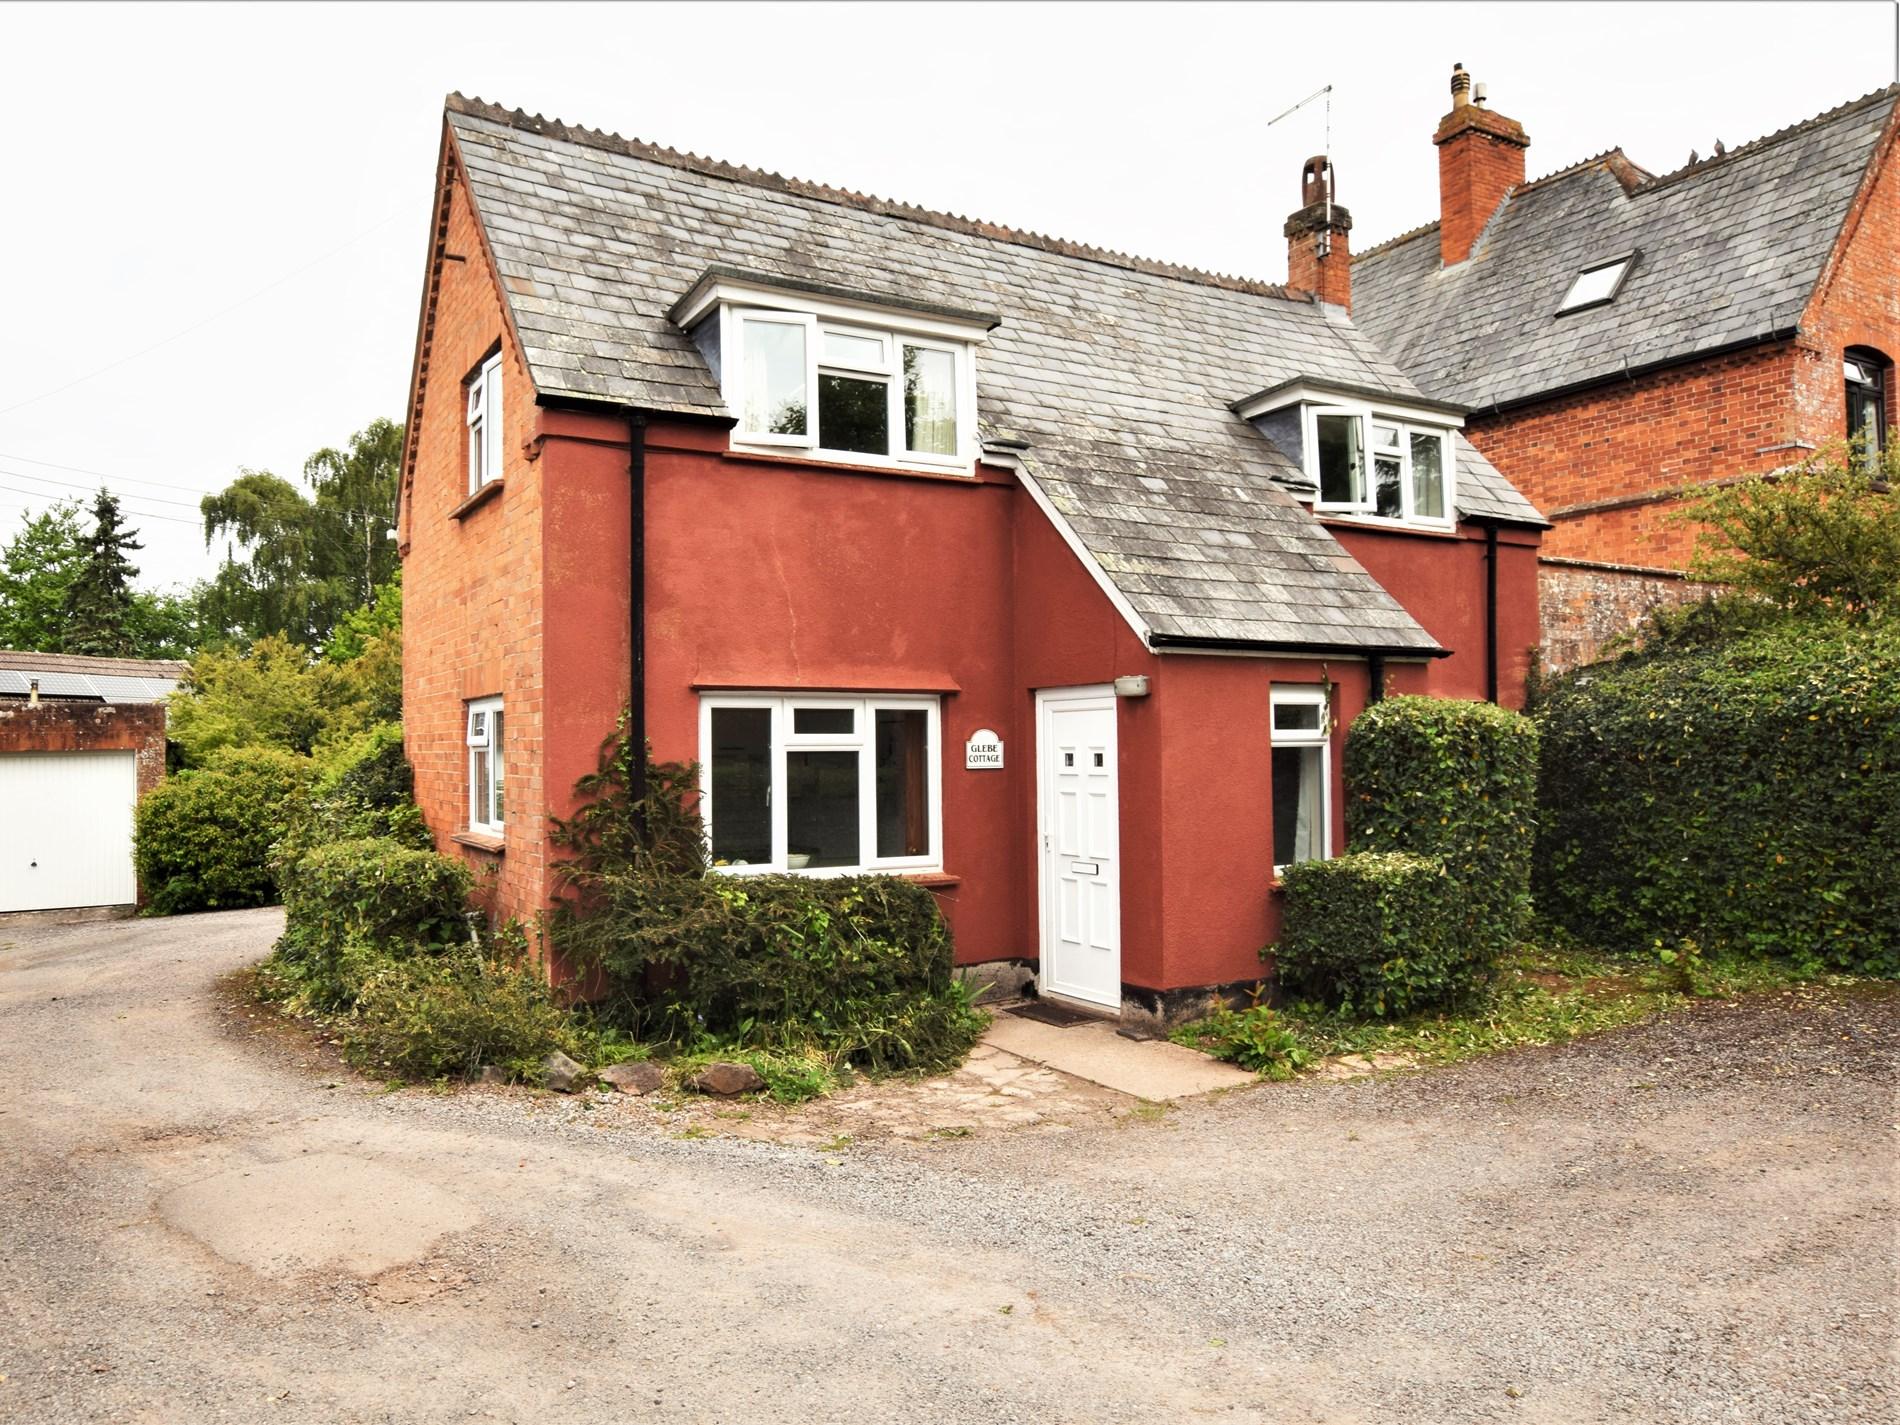 2 Bedroom House in Somerset, Dorset and Somerset